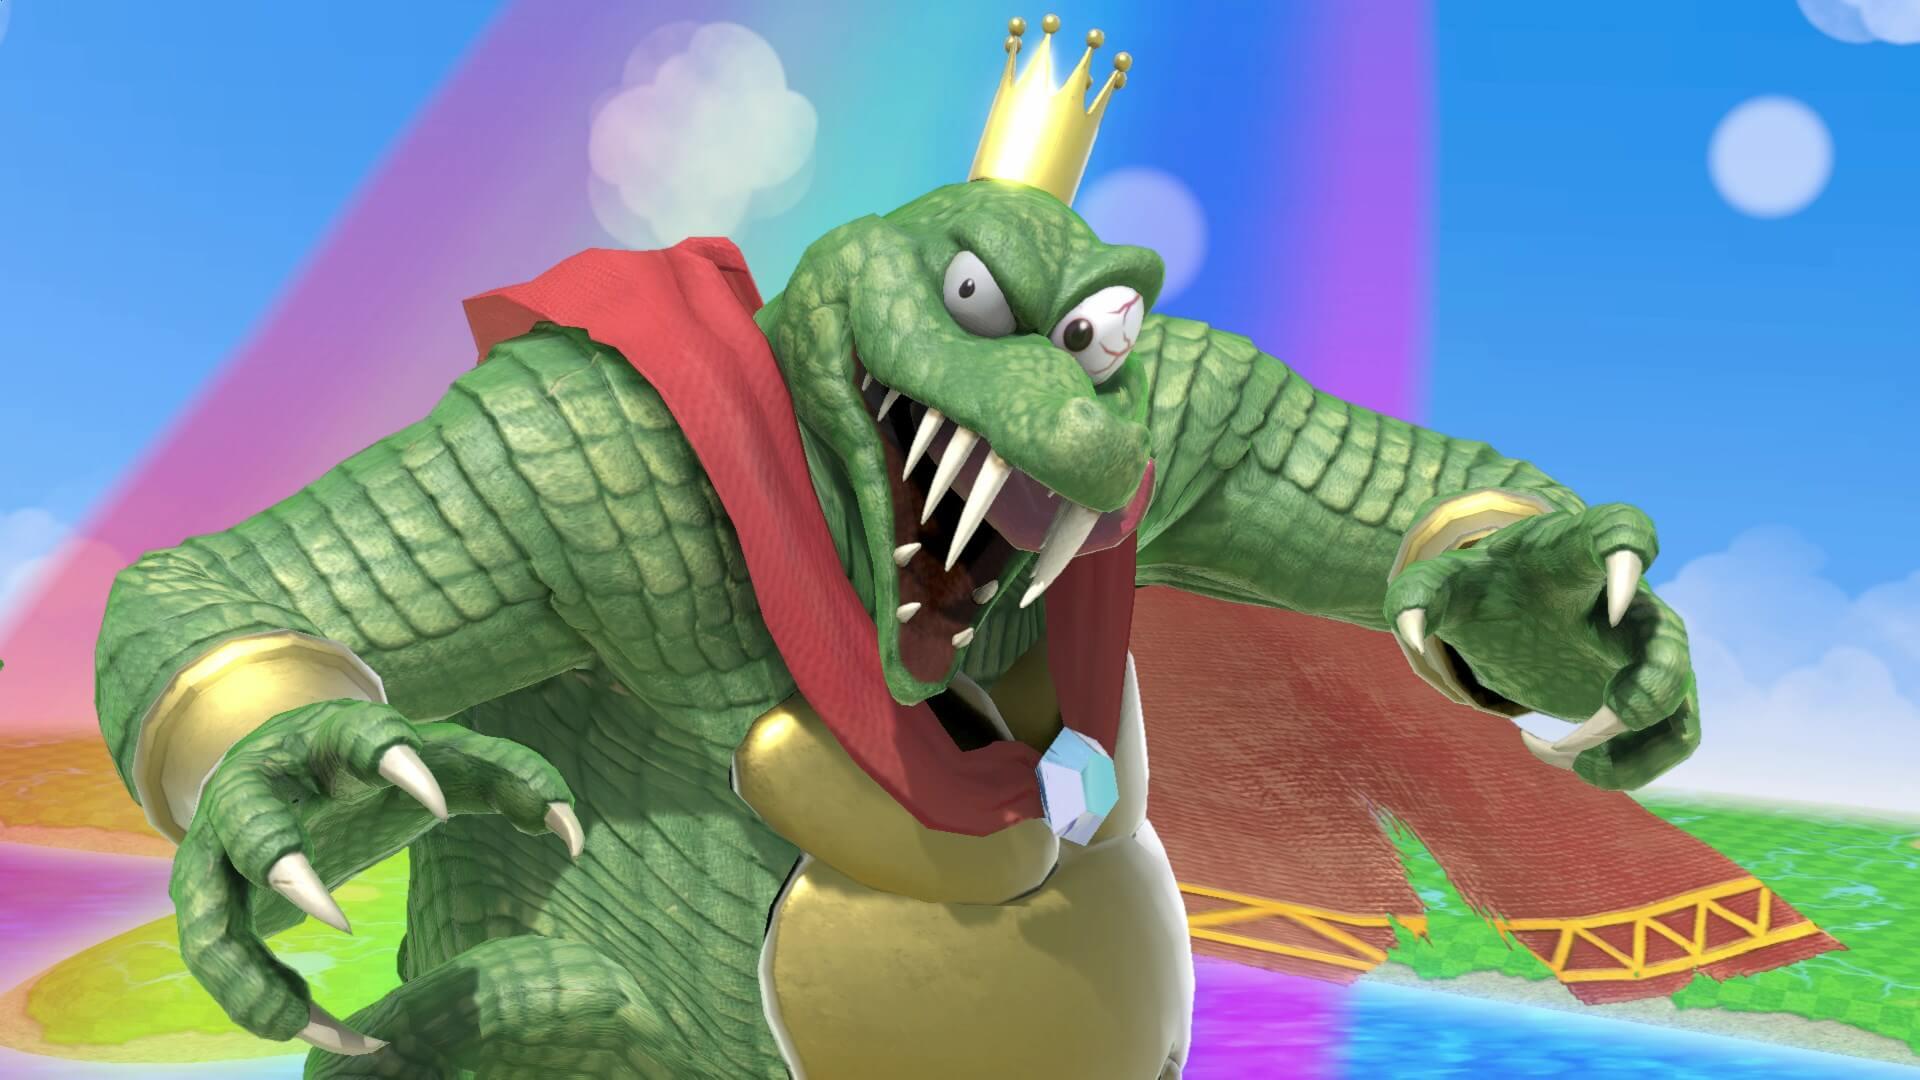 King K. Rool Rainbow